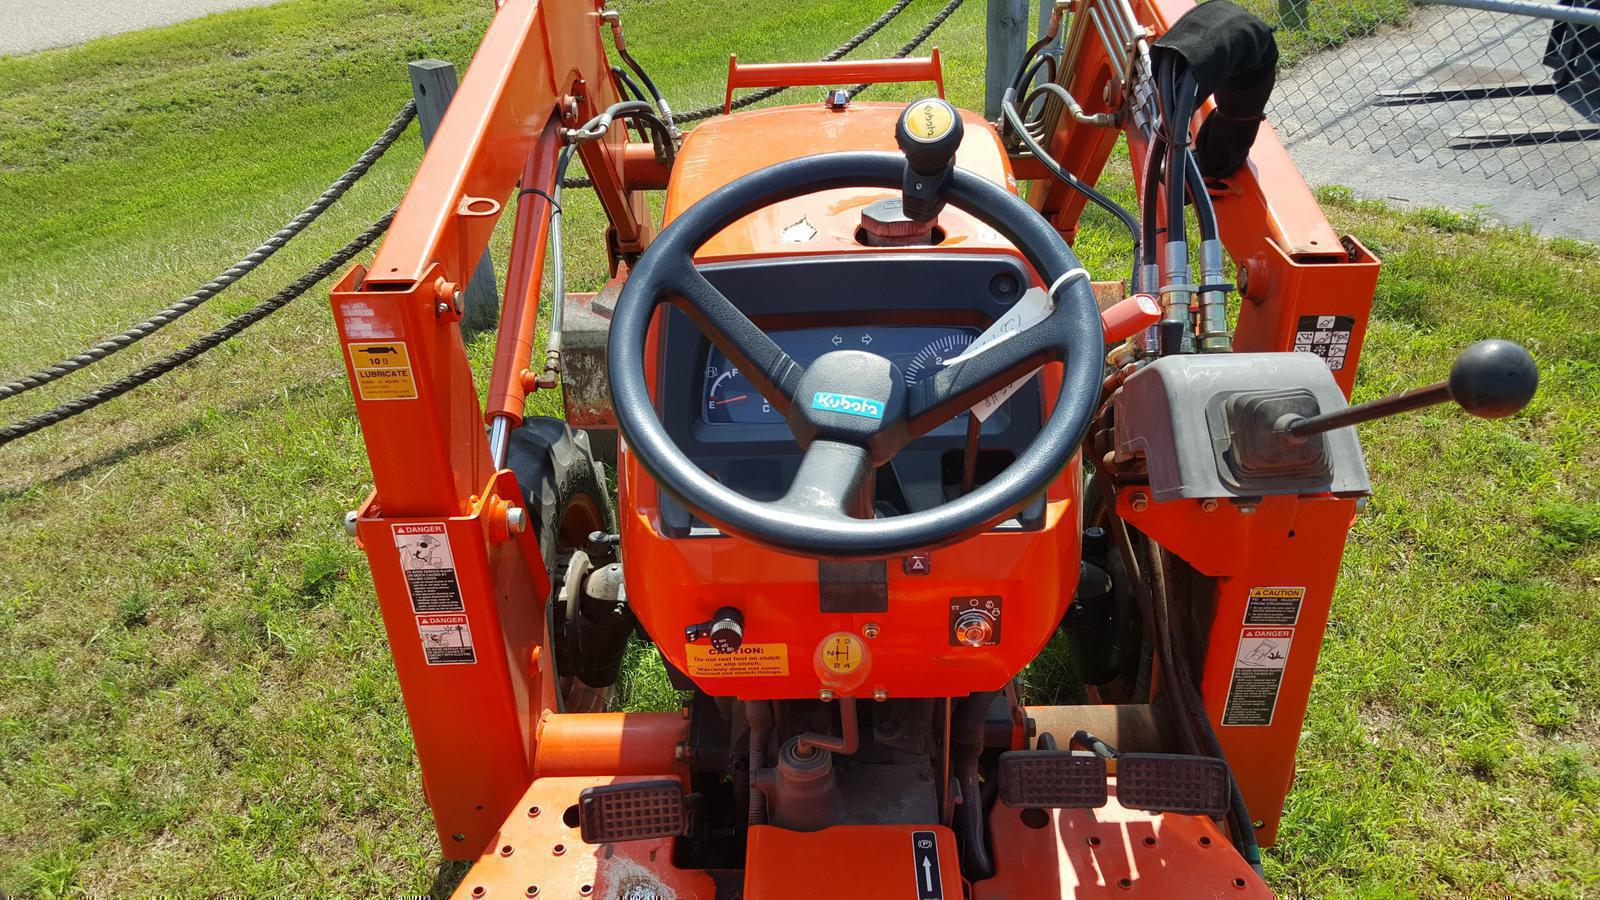 2008 Kubota L2800 Gear-Drive 4WD Compact Tractor